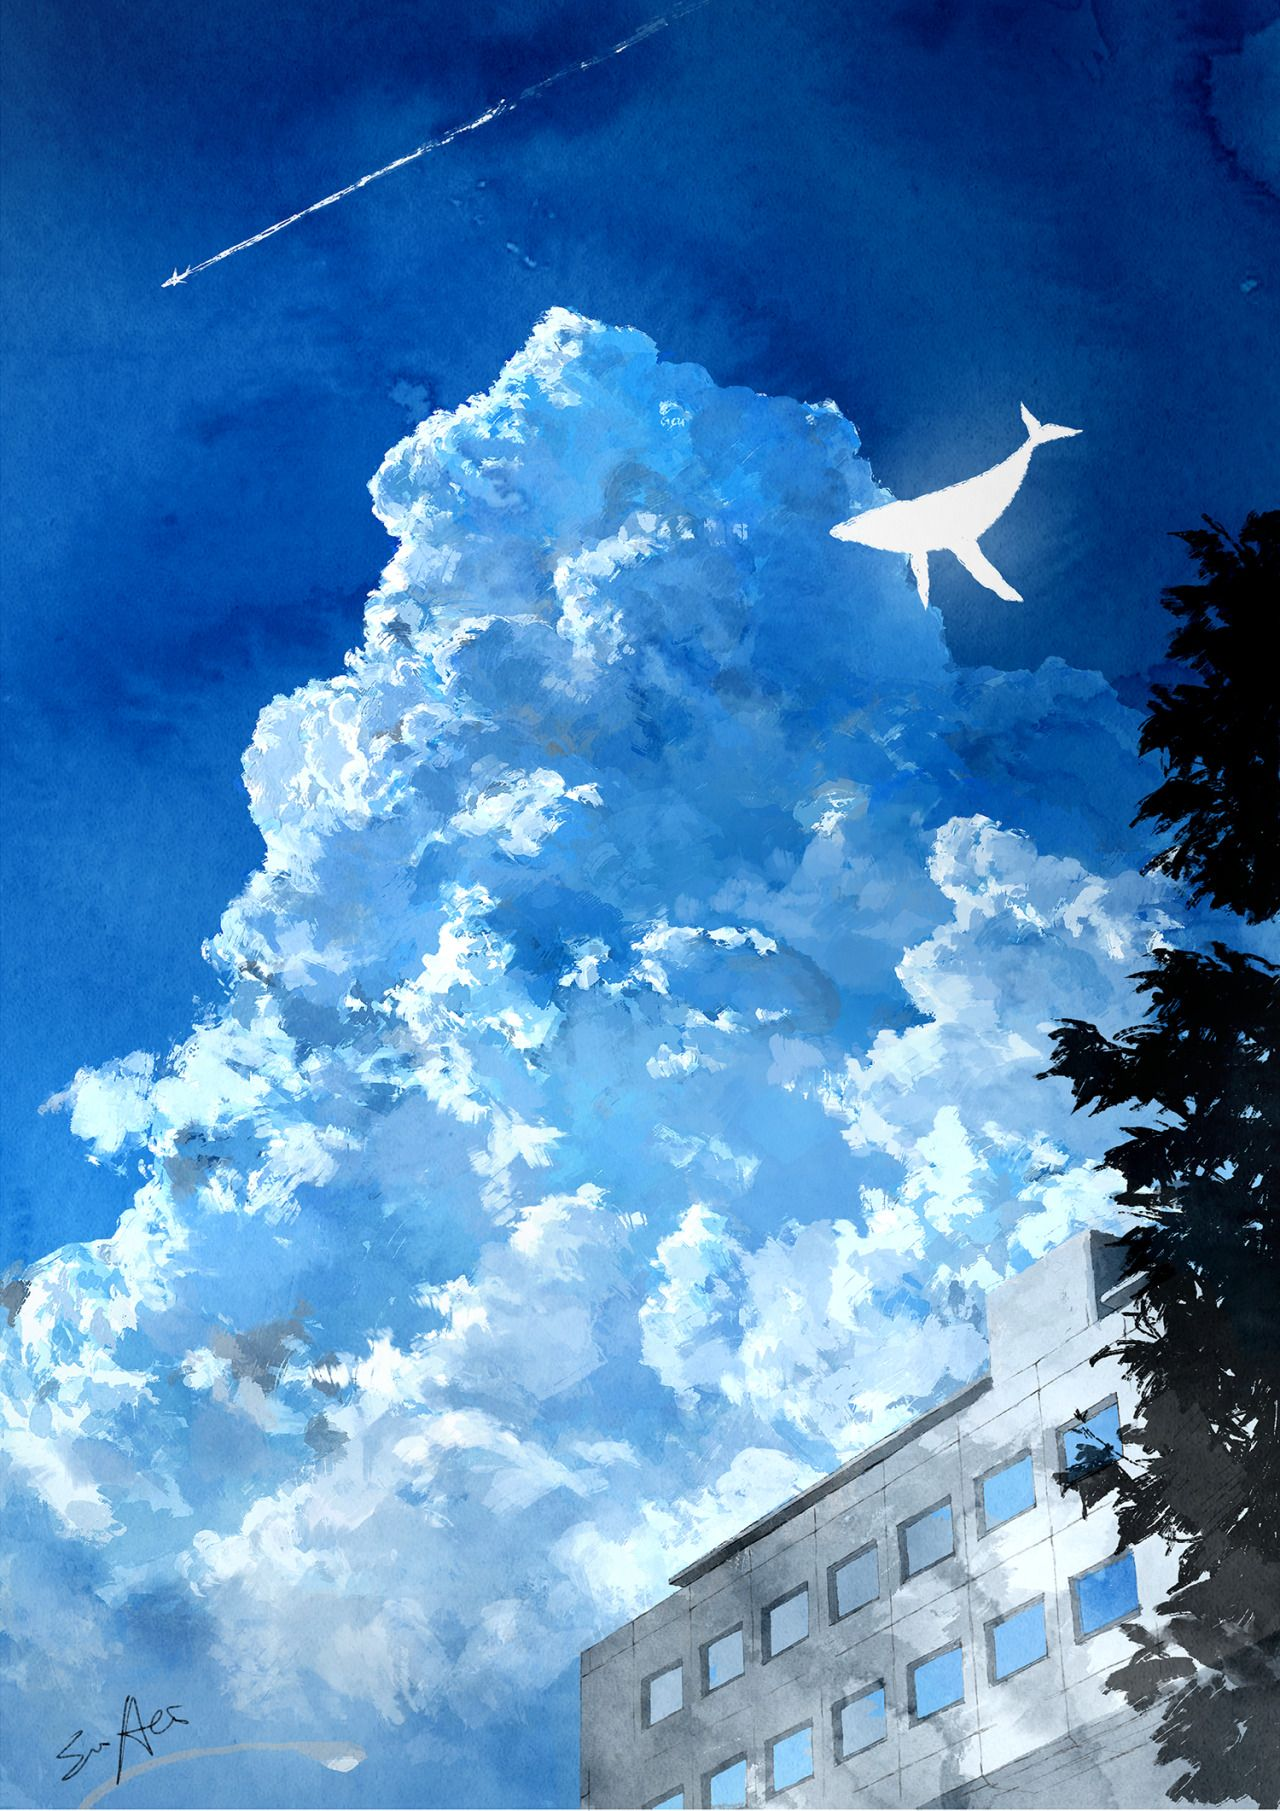 aofuji sui : 画像   綺麗   pinterest   絵、イラスト、插画